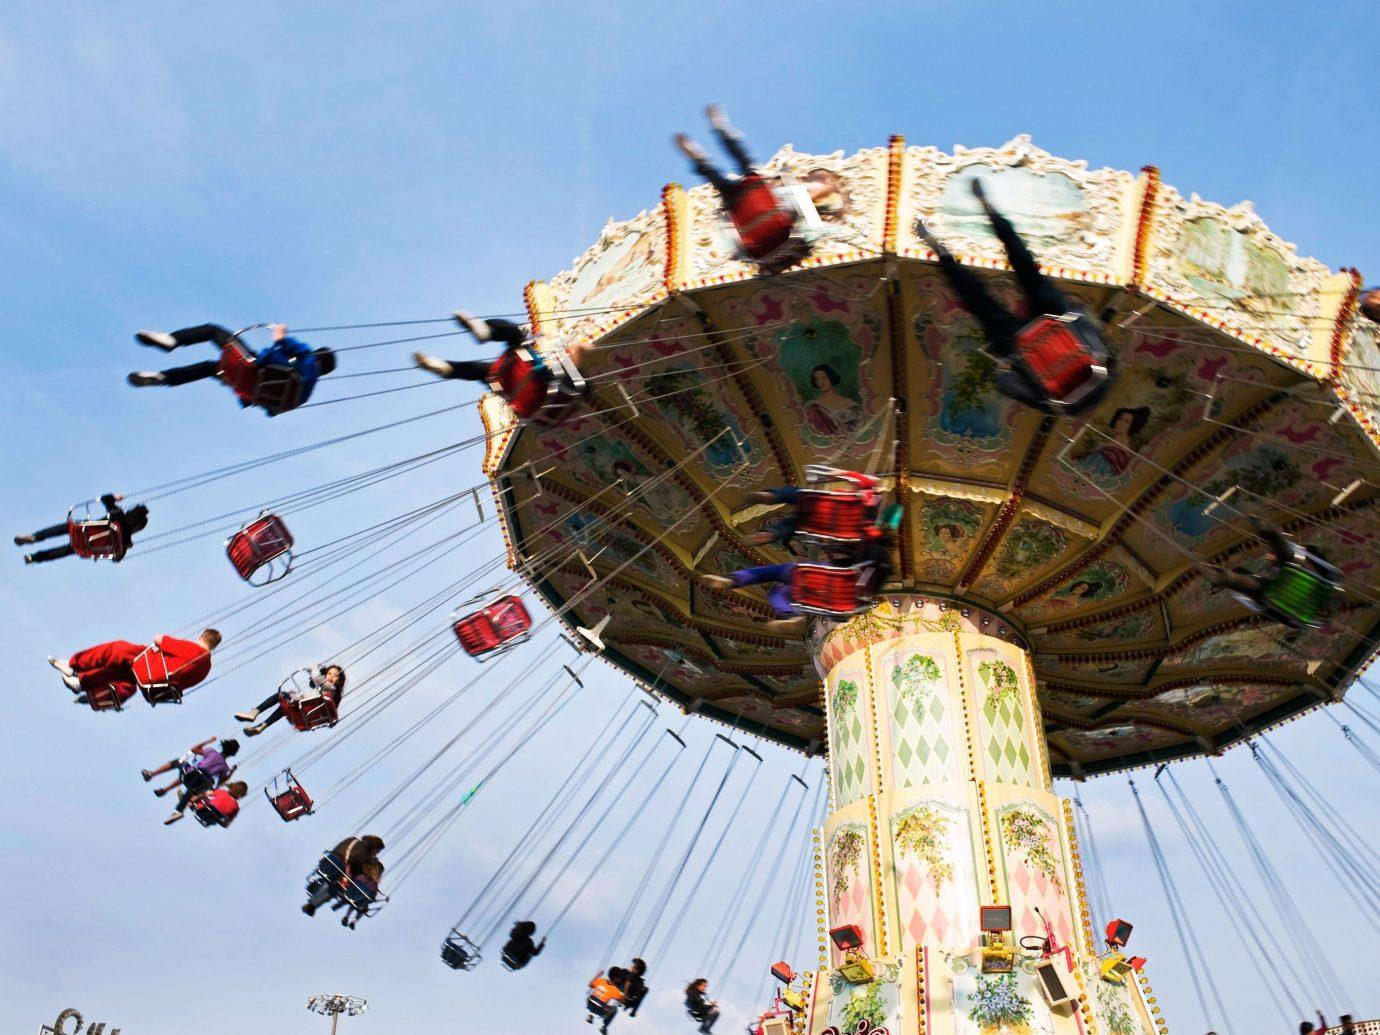 Offbeat sky amusement park outdoor atmosphere of earth park outdoor recreation amusement ride recreation extreme sport fair tourist attraction